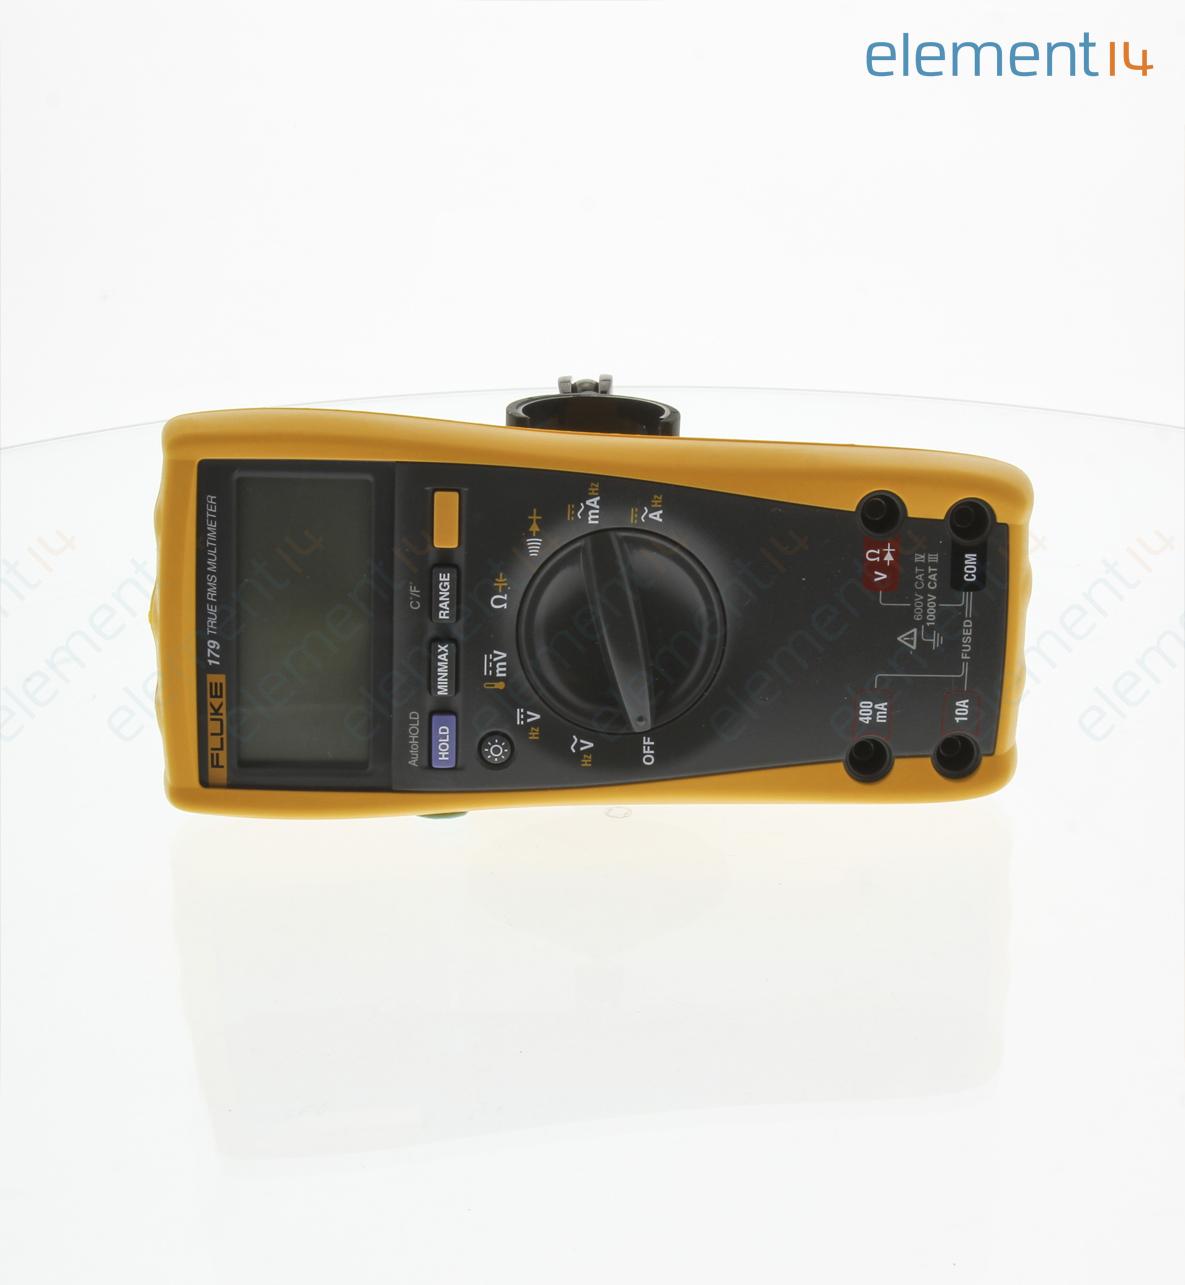 Handheld Digital Multimeter, 170 Series, 6000 Count, True RMS, Auto, Manual  Range, 3 75 Digit